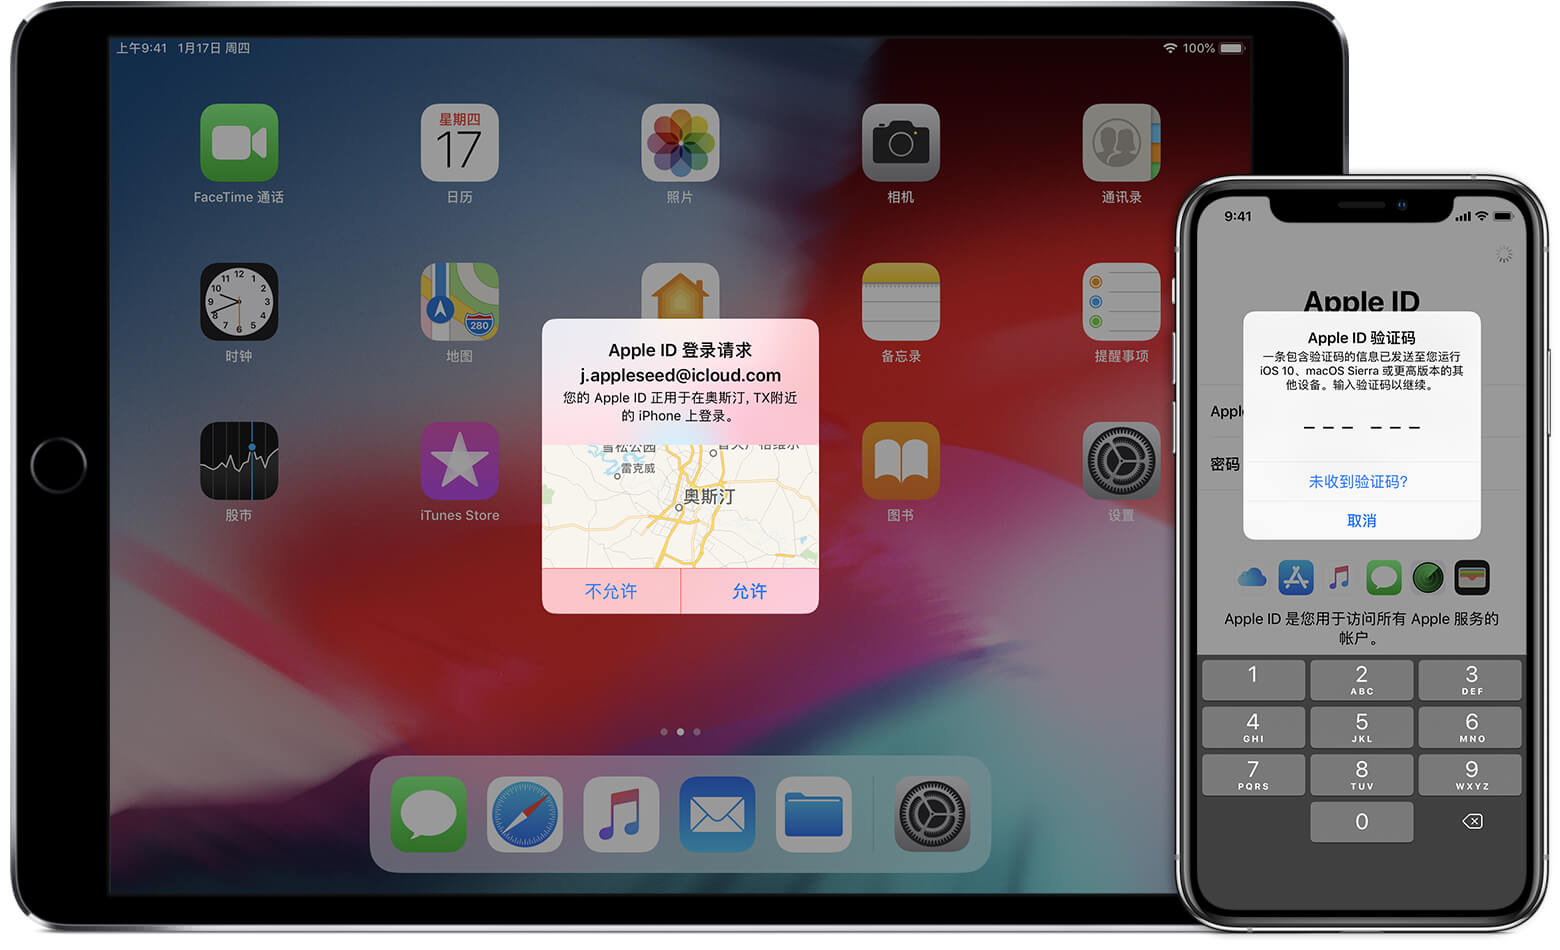 谨防 Apple ID 被盗刷,设置时必须注意两点